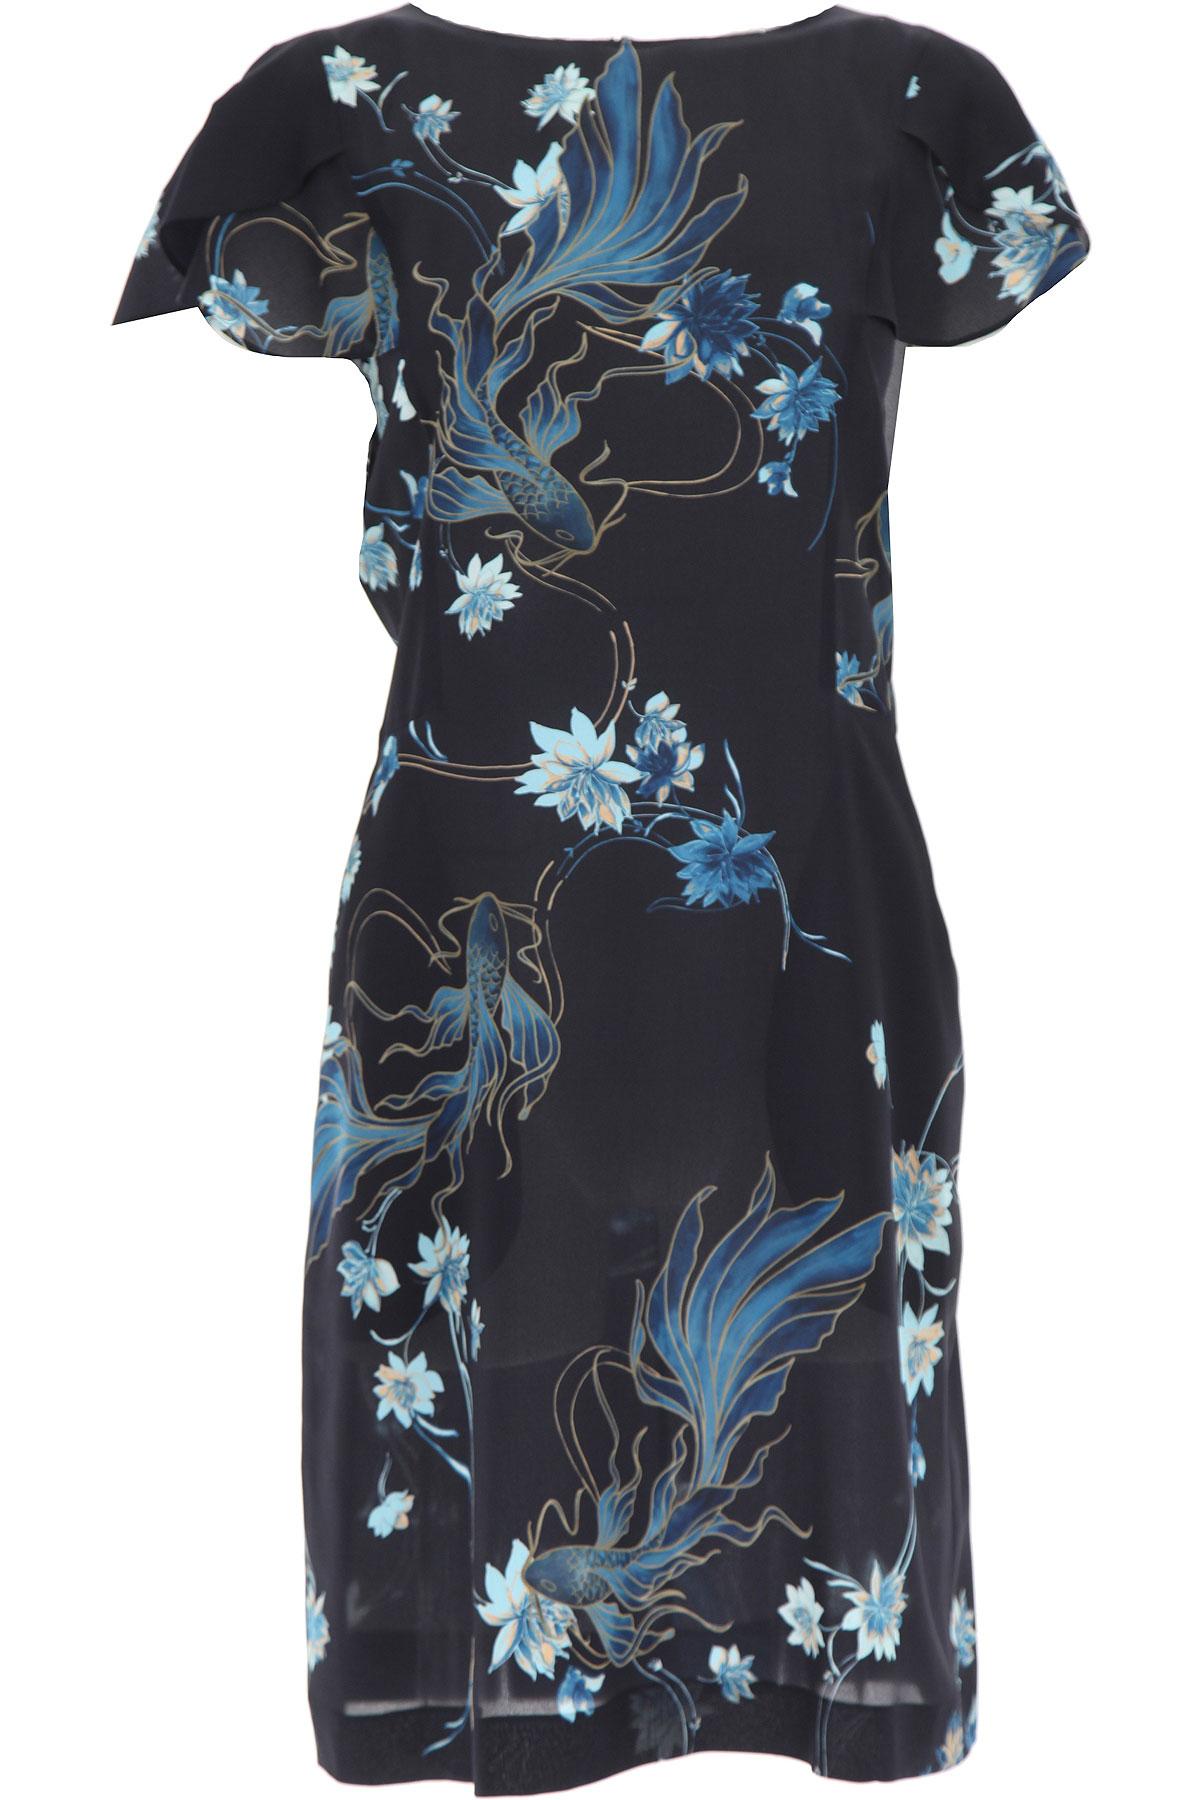 Alberta Ferretti Dress for Women, Evening Cocktail Party On Sale, Dark Midnight Blue, cupro, 2019, 4 6 8